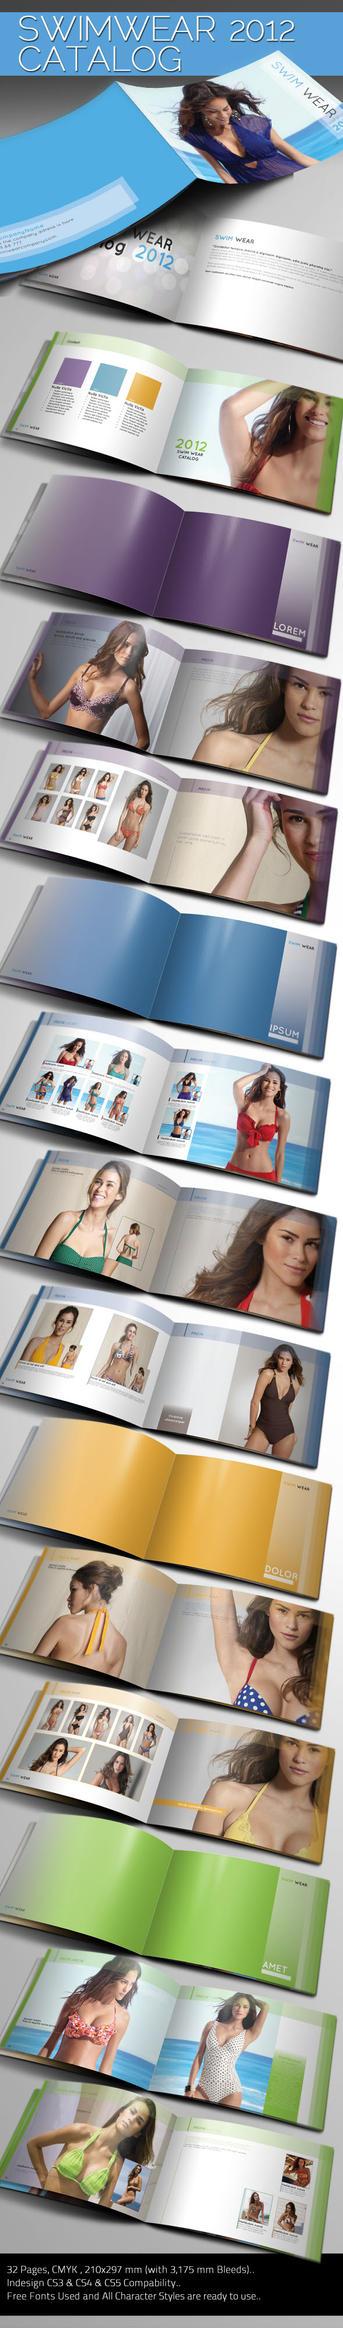 Elite Swimwear Catalog by BALKAy